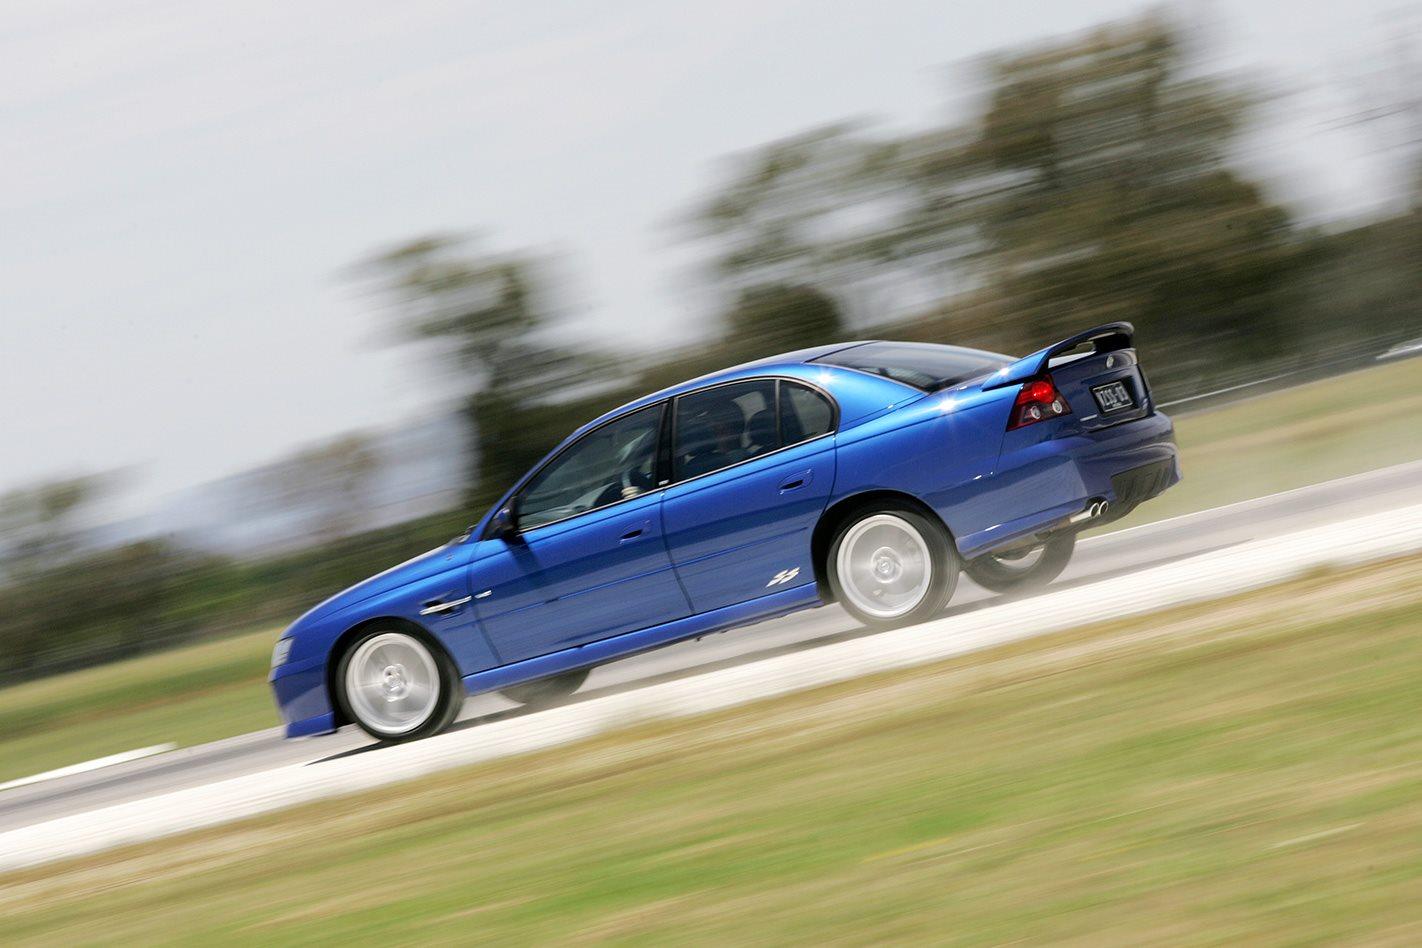 2004-Holden-Commodore-SS.jpg